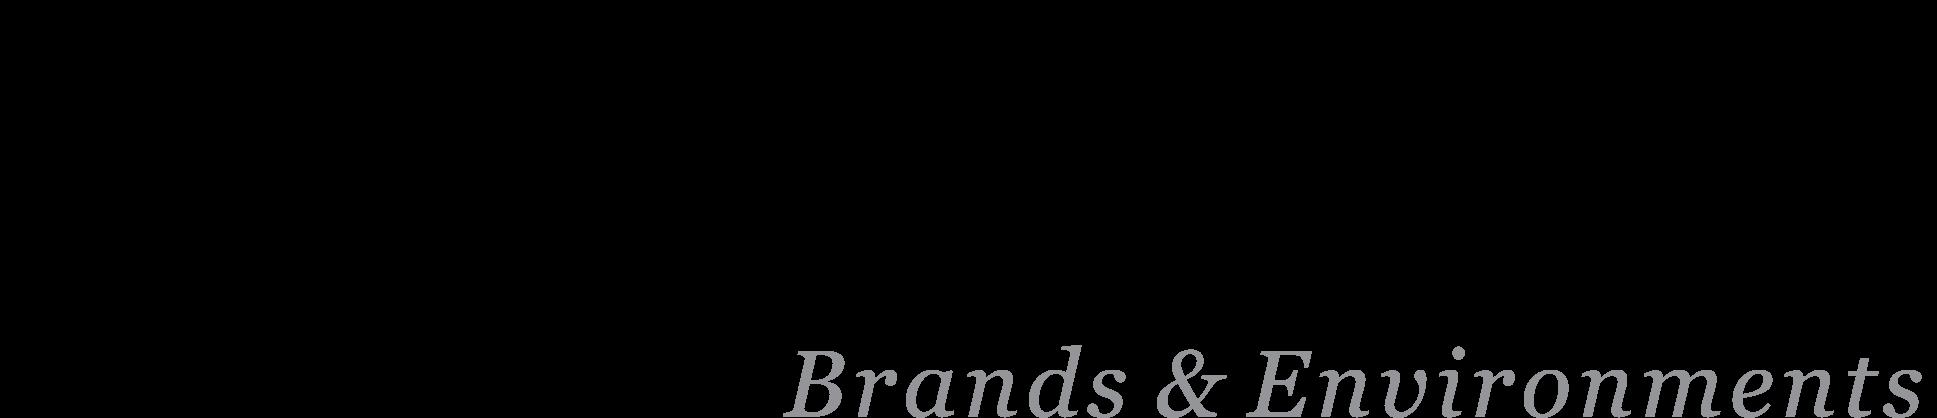 white_logo_tag.png